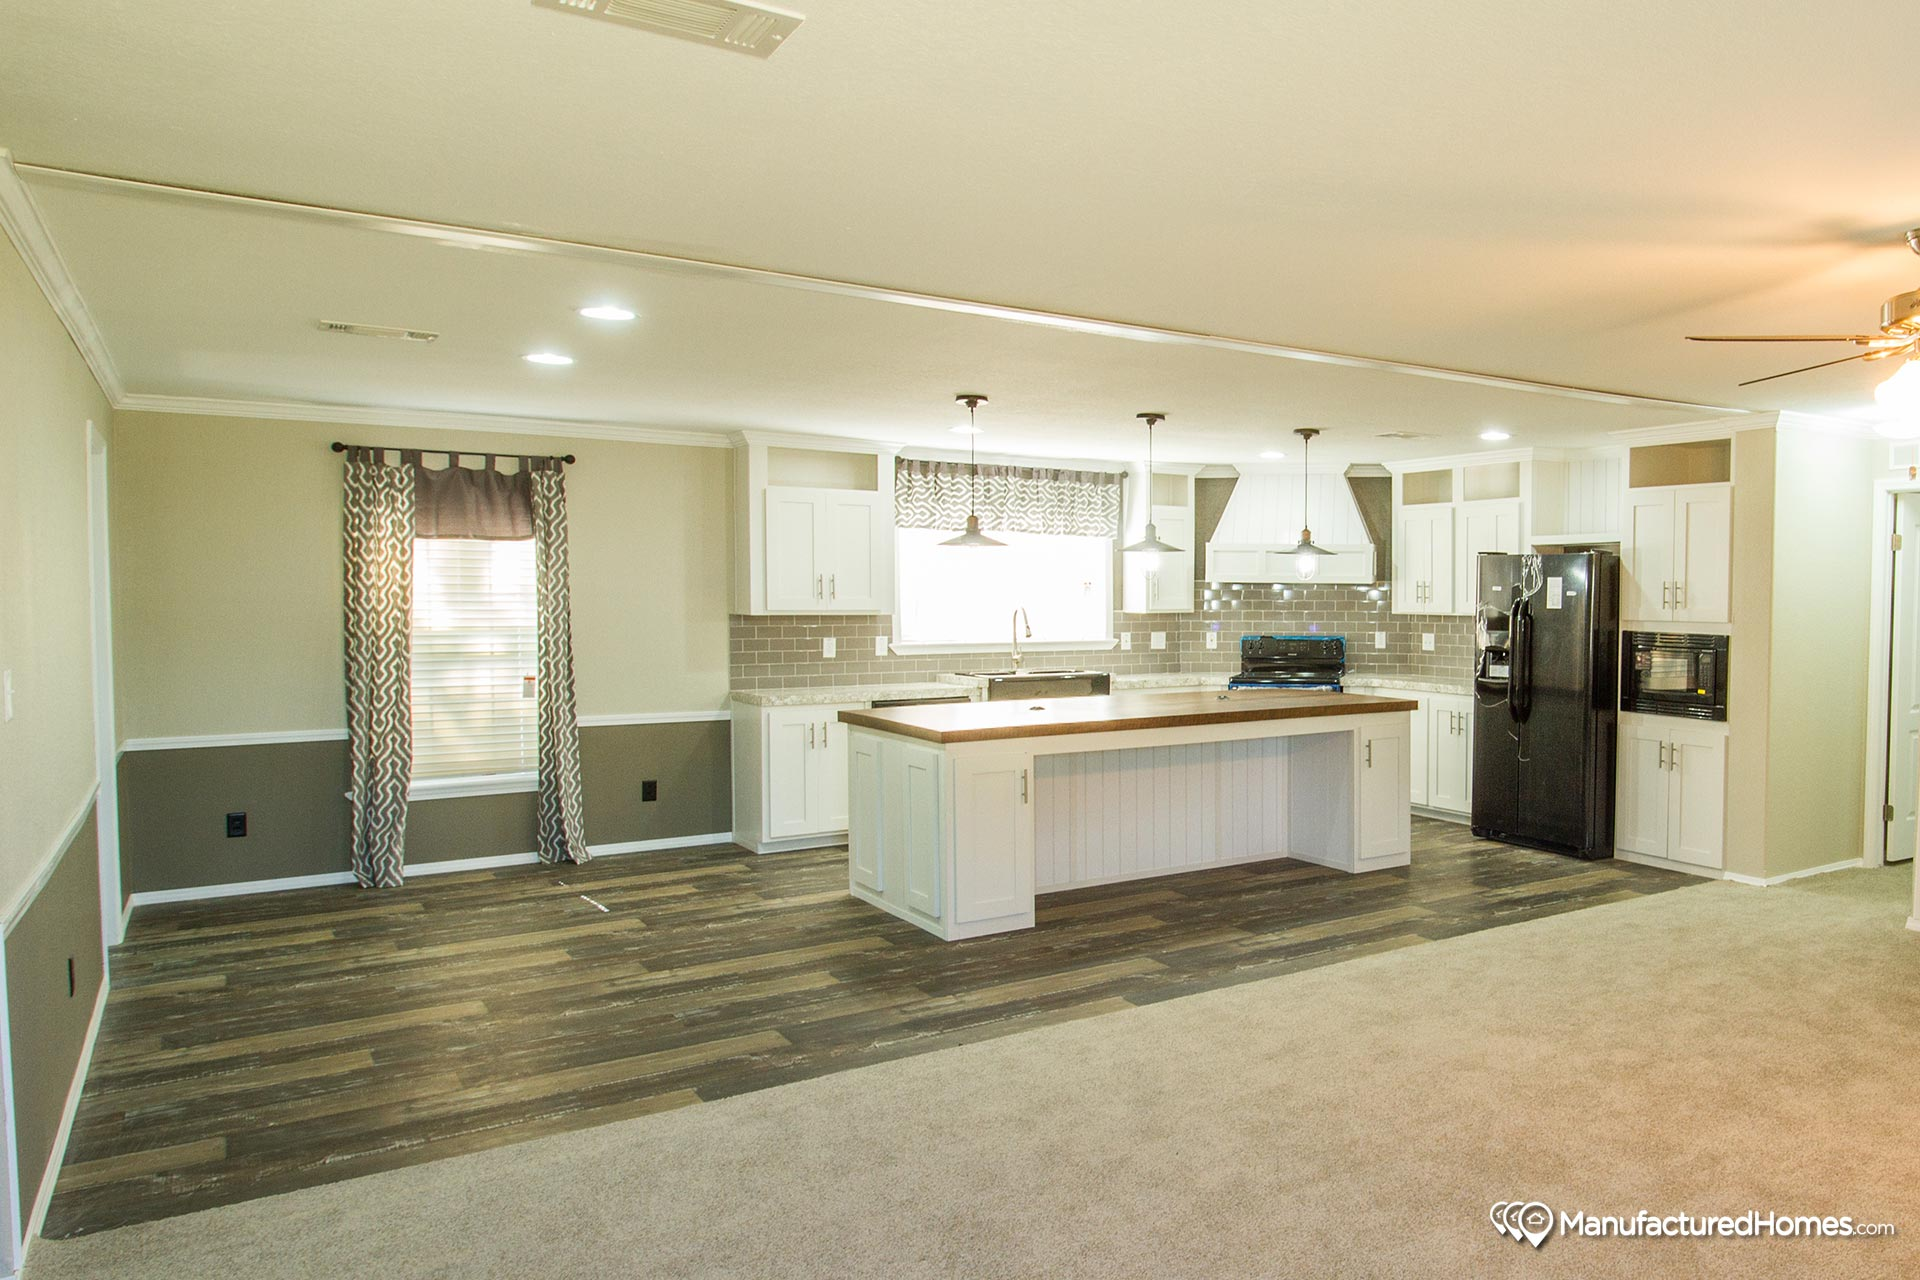 Tandem Home Center in Tyler, TX - Manufactured Home Dealer